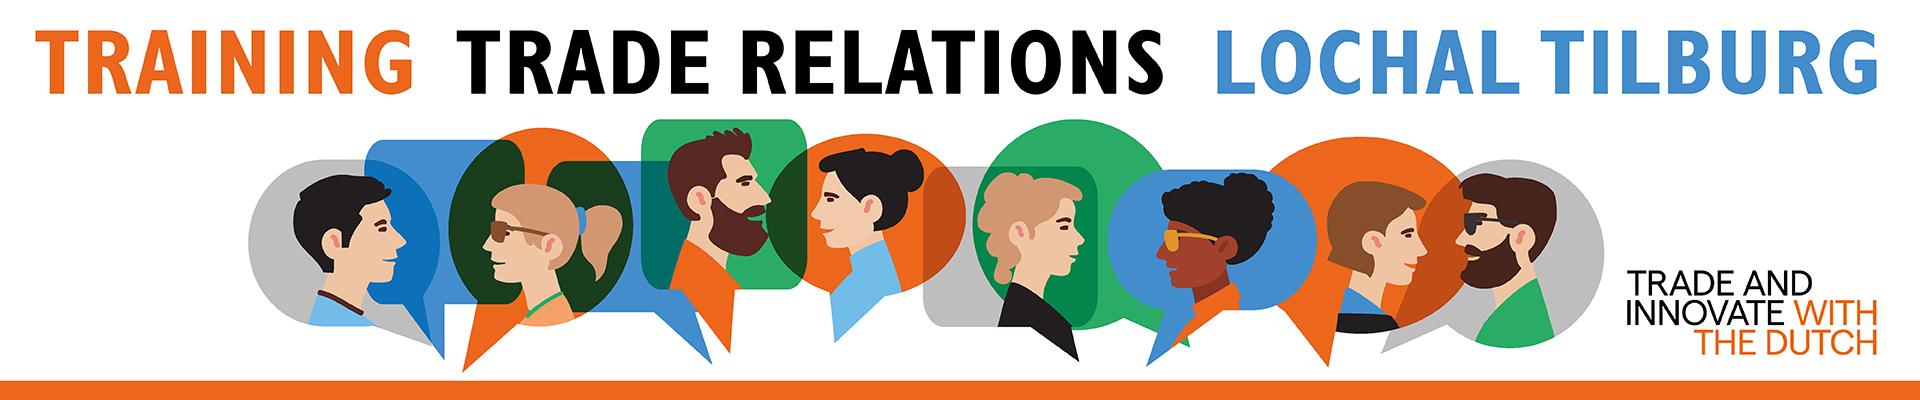 Training Trade Relations - Lochal Tilburg